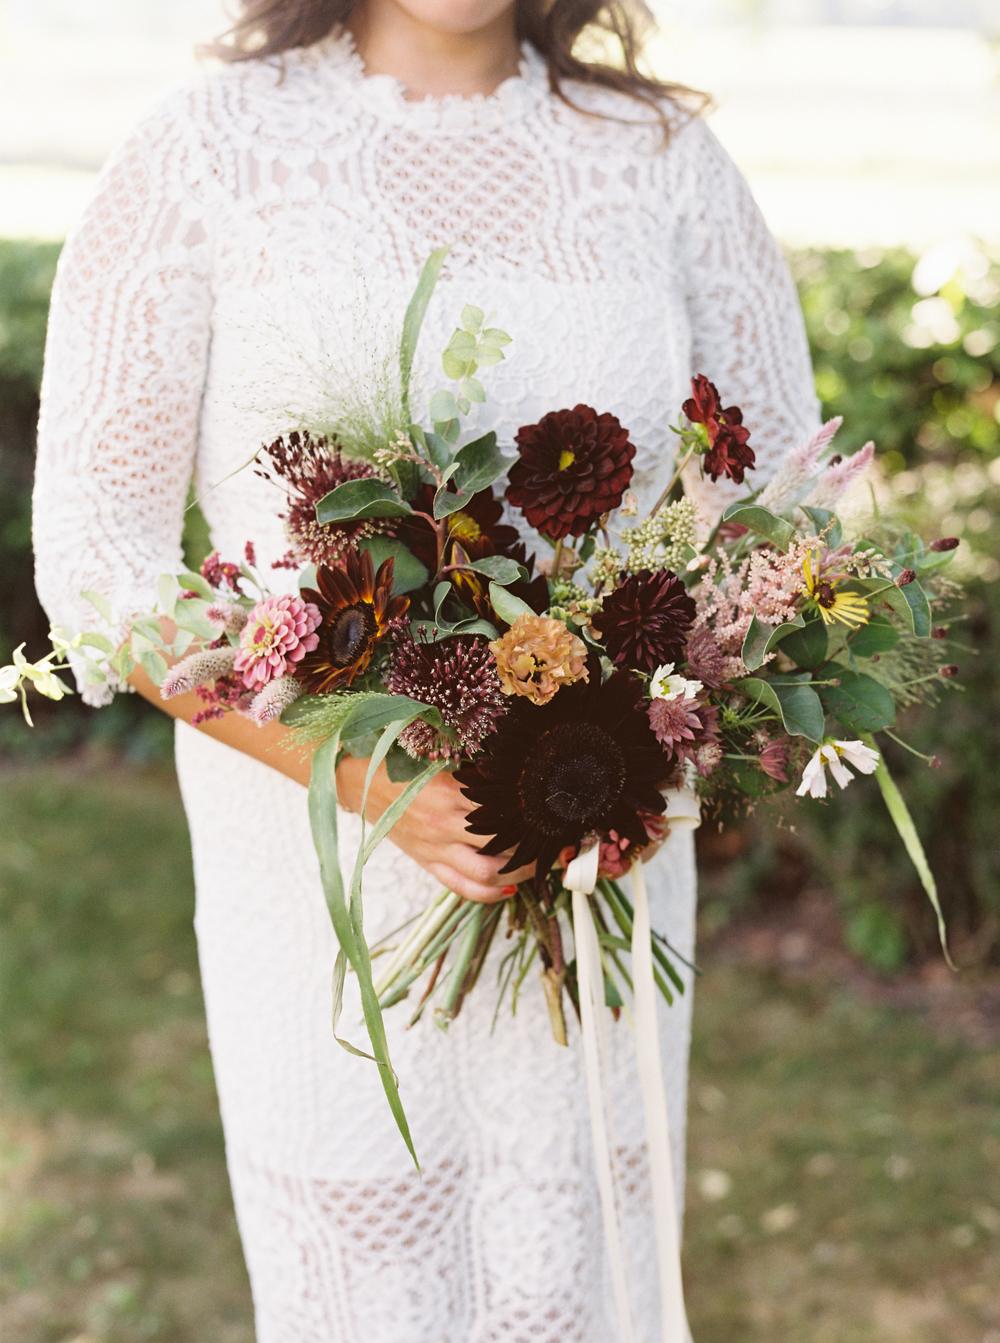 cristina-lozito-photography-flowers-19.jpg